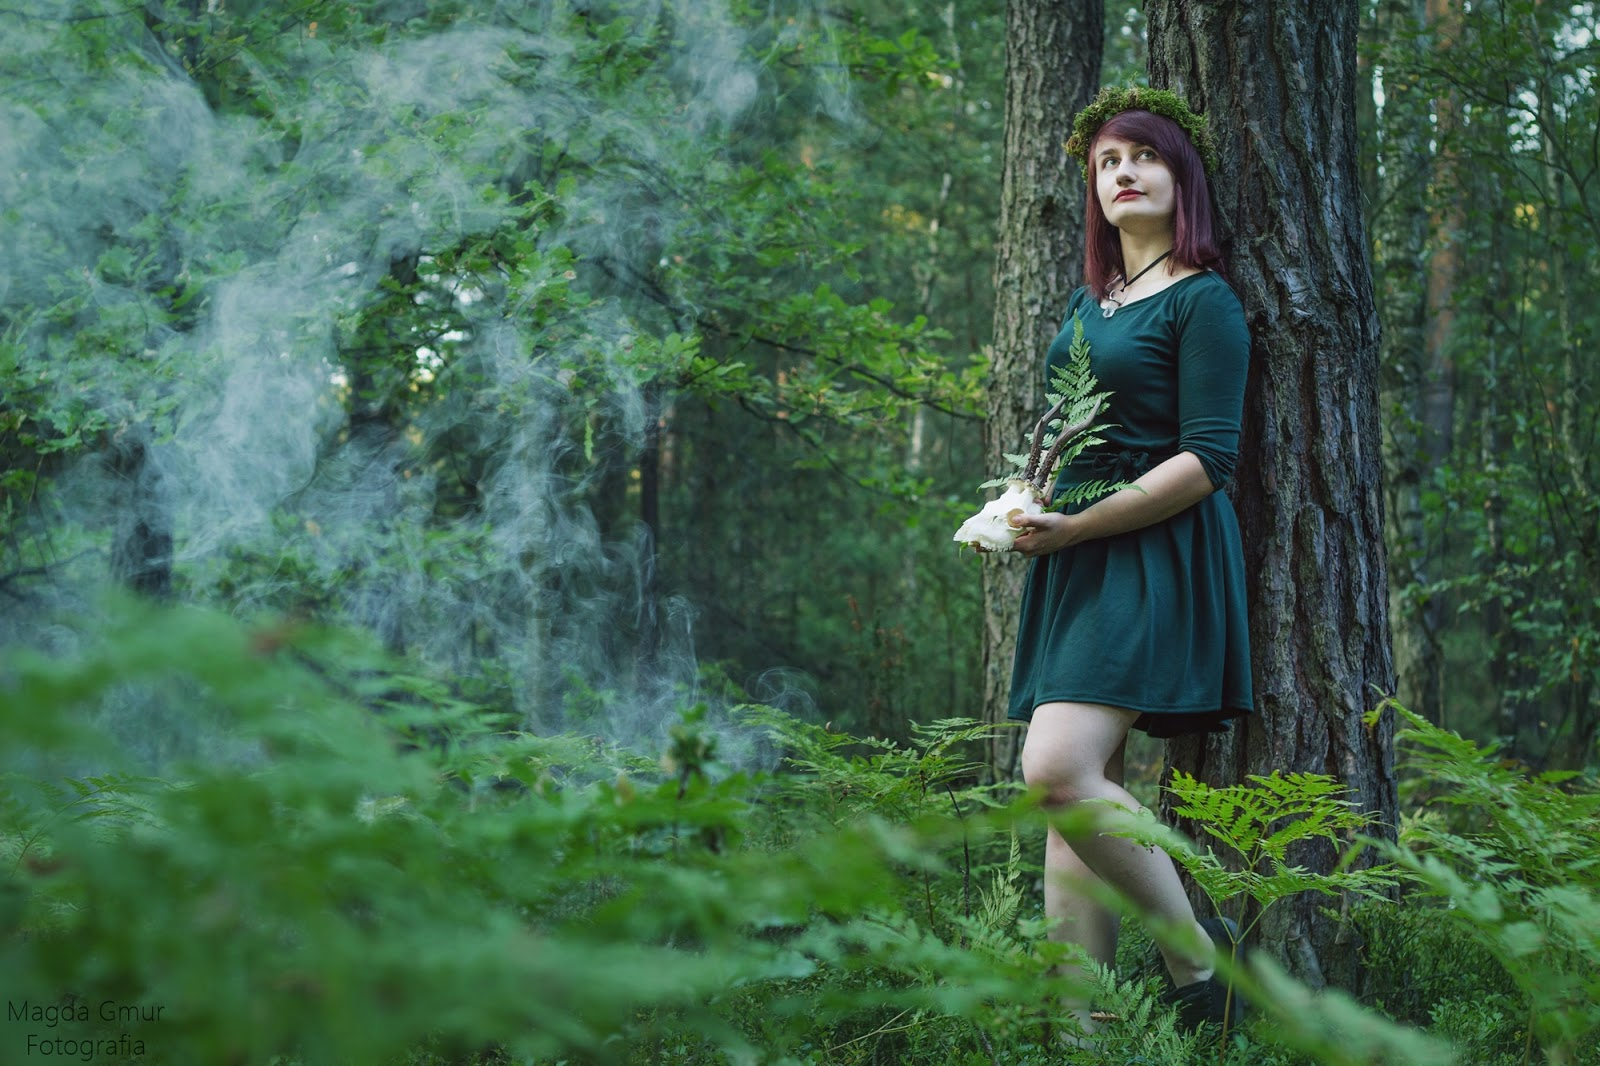 Sesja w lesie, zieleń, rogi jelenia sesja, rogi sesja, kulki dymne